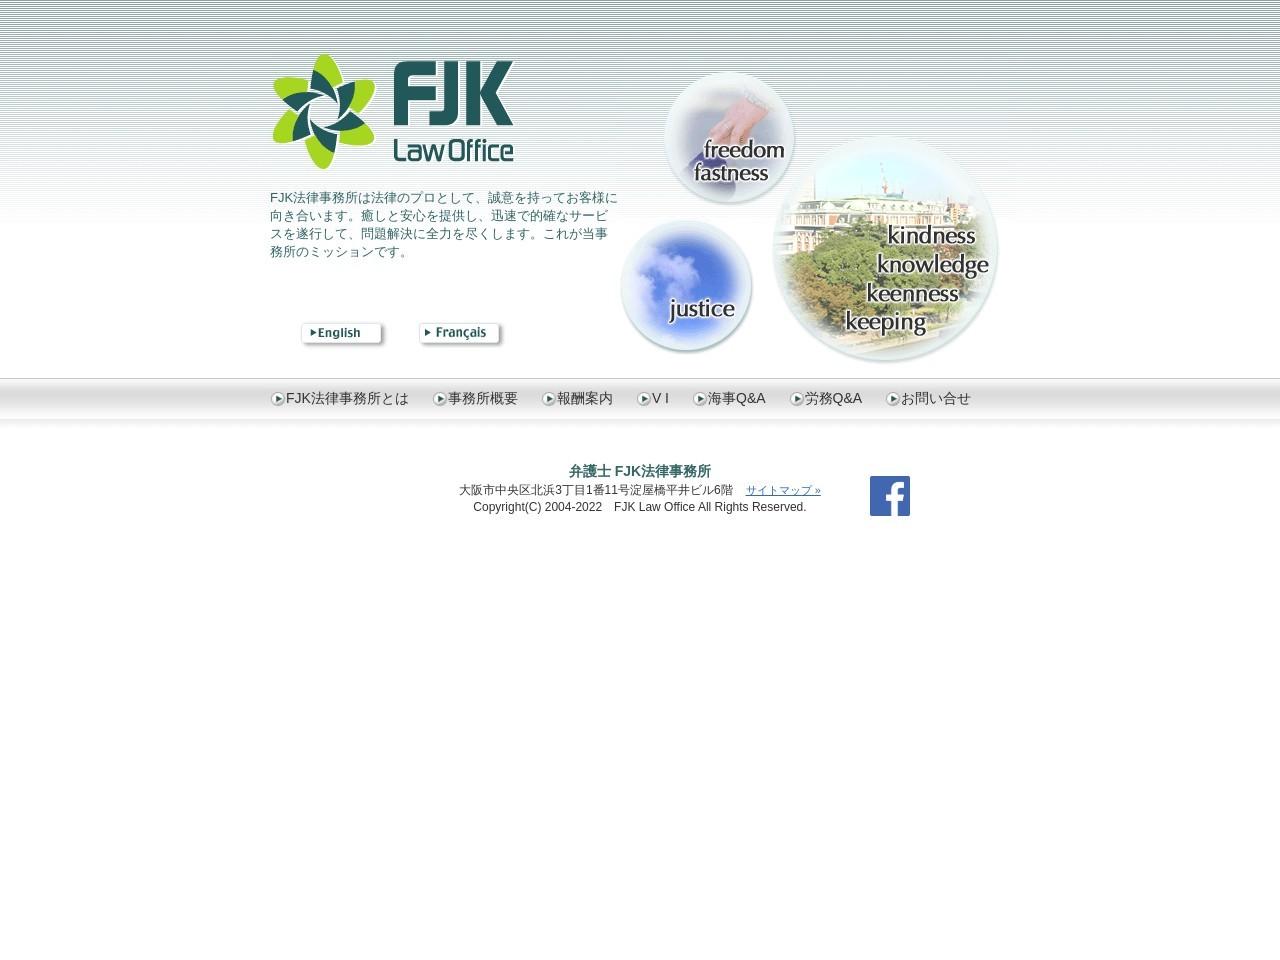 FJK法律事務所